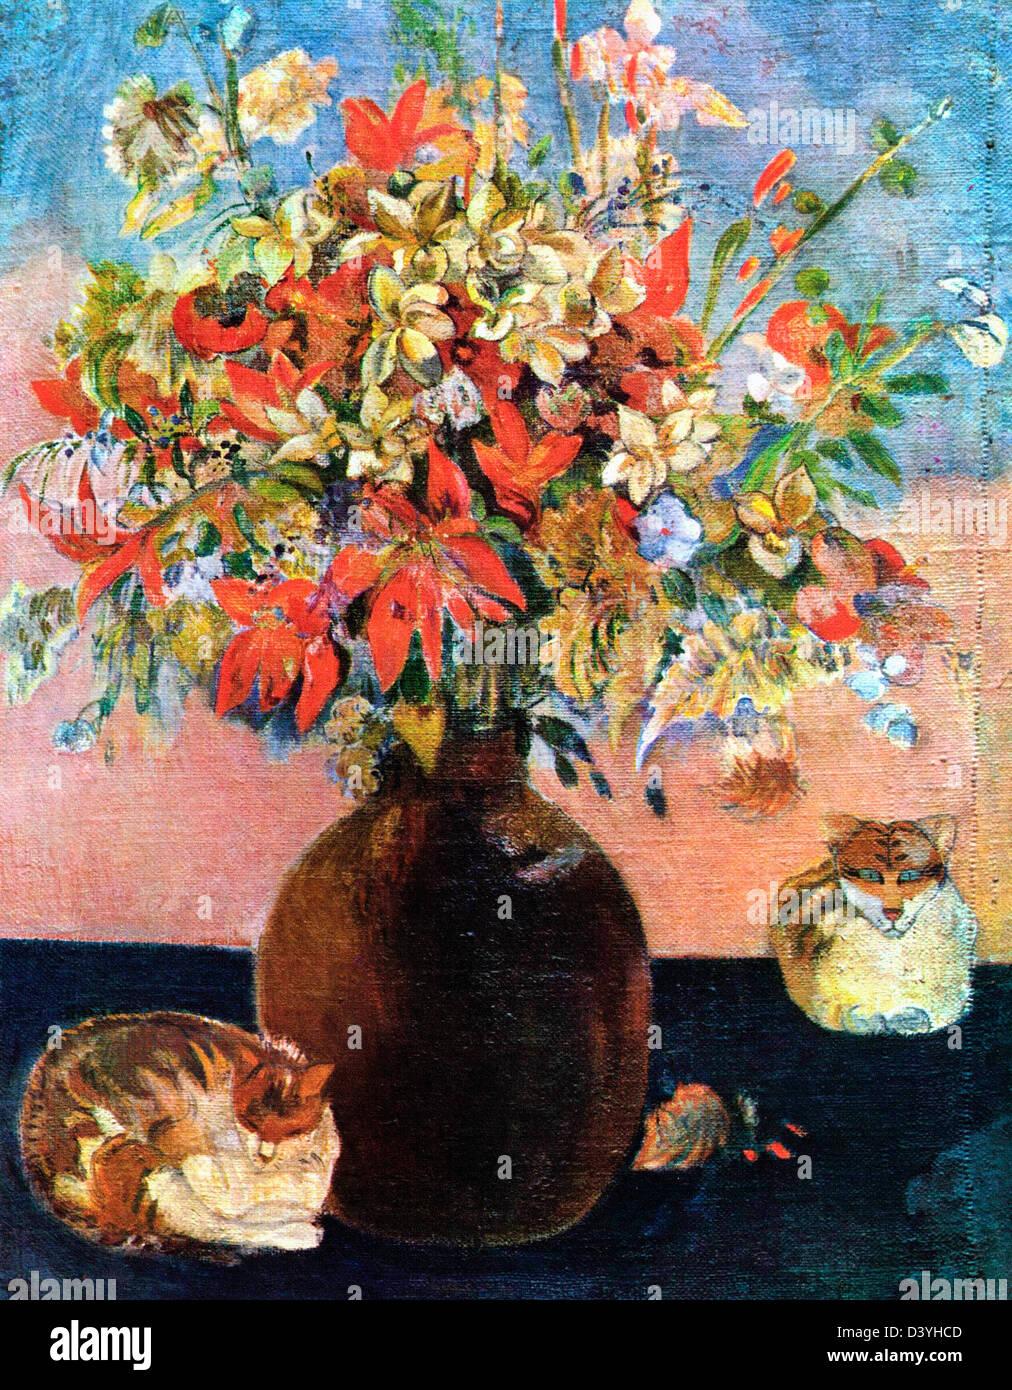 Paul Gauguin, Flowers and cats 1899 Oil on canvas. Ny Carlsberg Glyptotek, Copenhagen - Stock Image